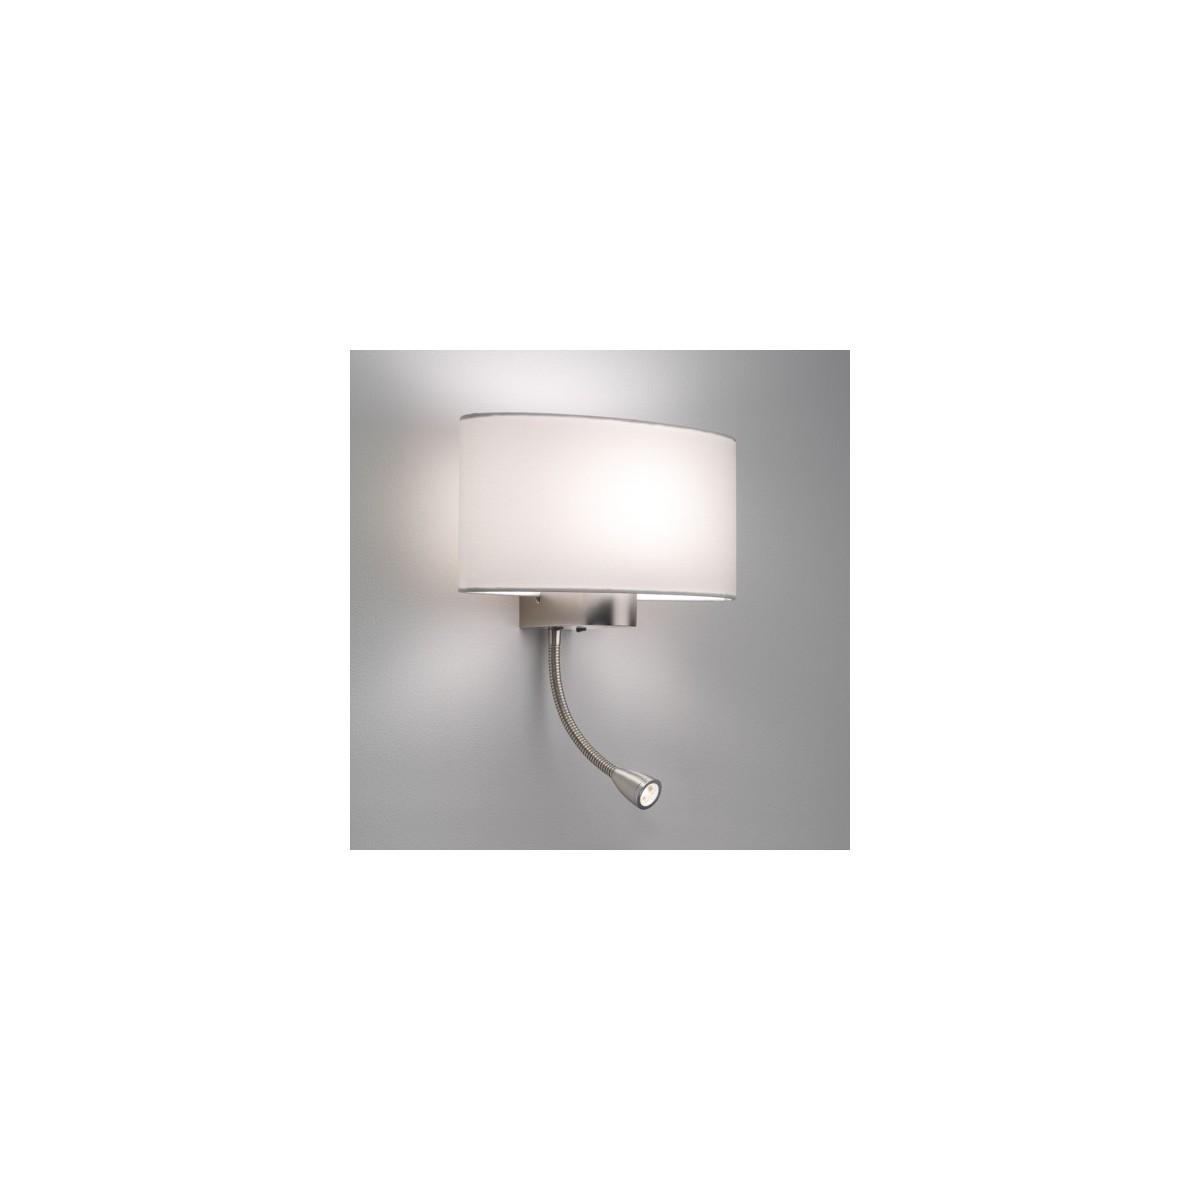 Astro Napoli LED Do Czytania 1x60W Max E27 Matowy Nikiel 1185002